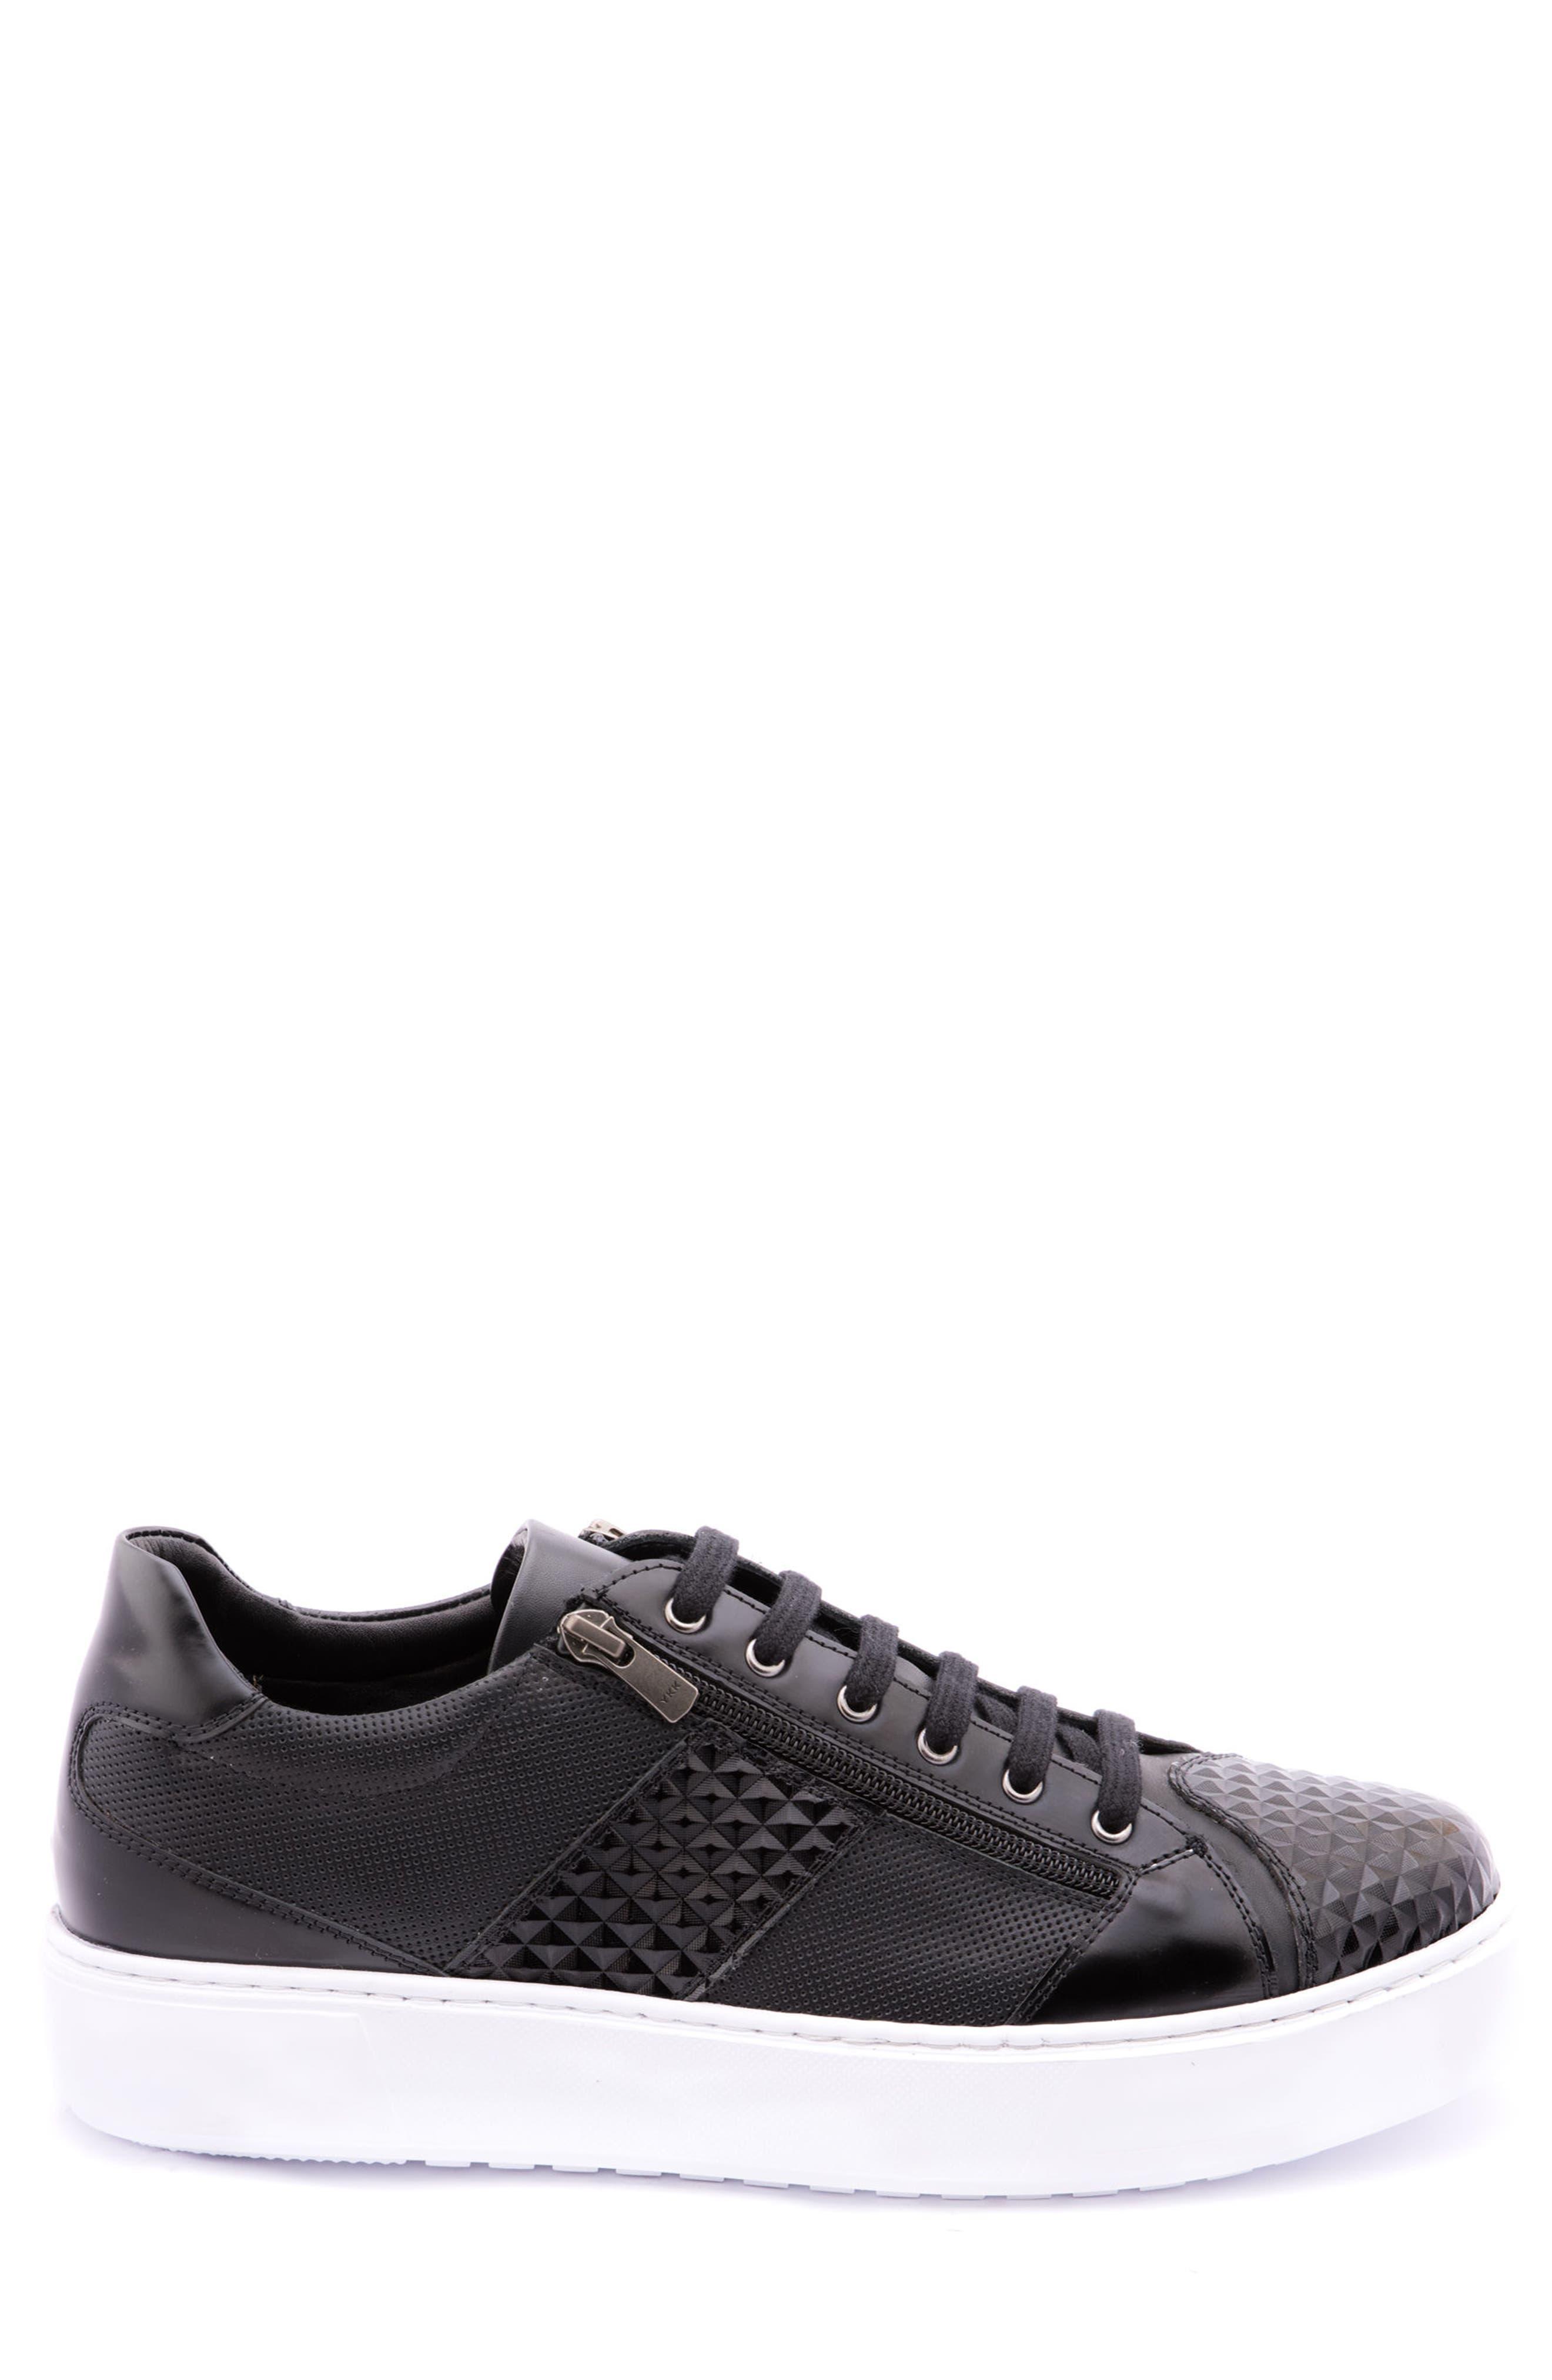 Justin Perforated Sneaker,                             Alternate thumbnail 3, color,                             Black